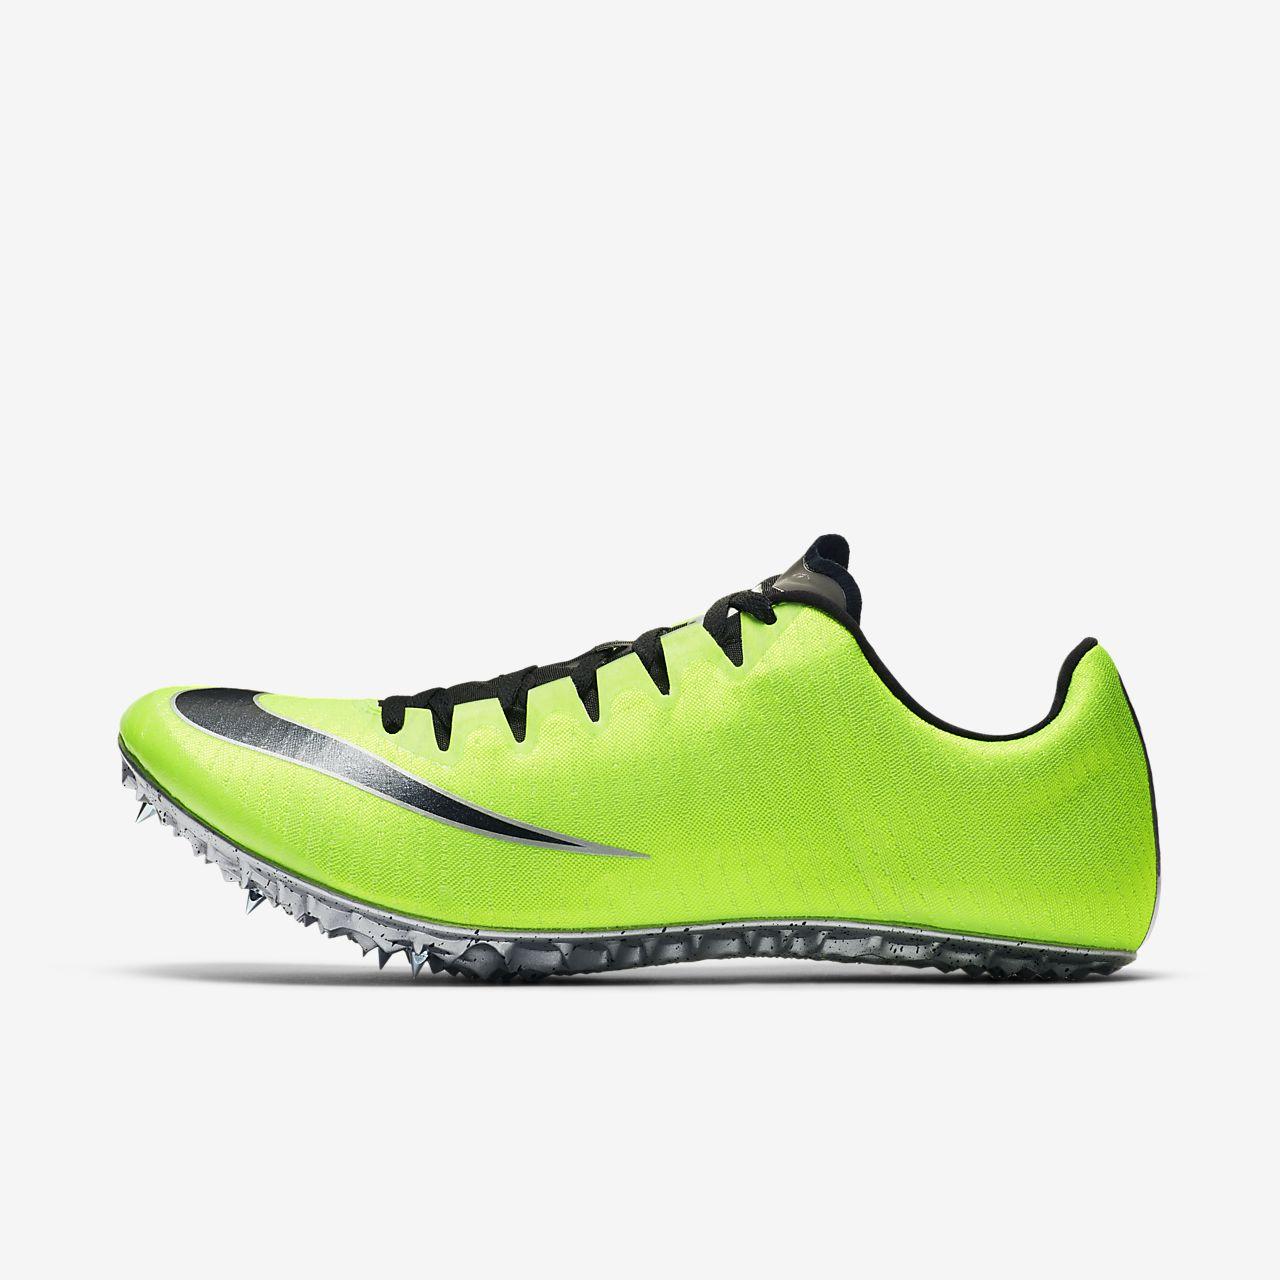 modelli scarpe chiodate nike